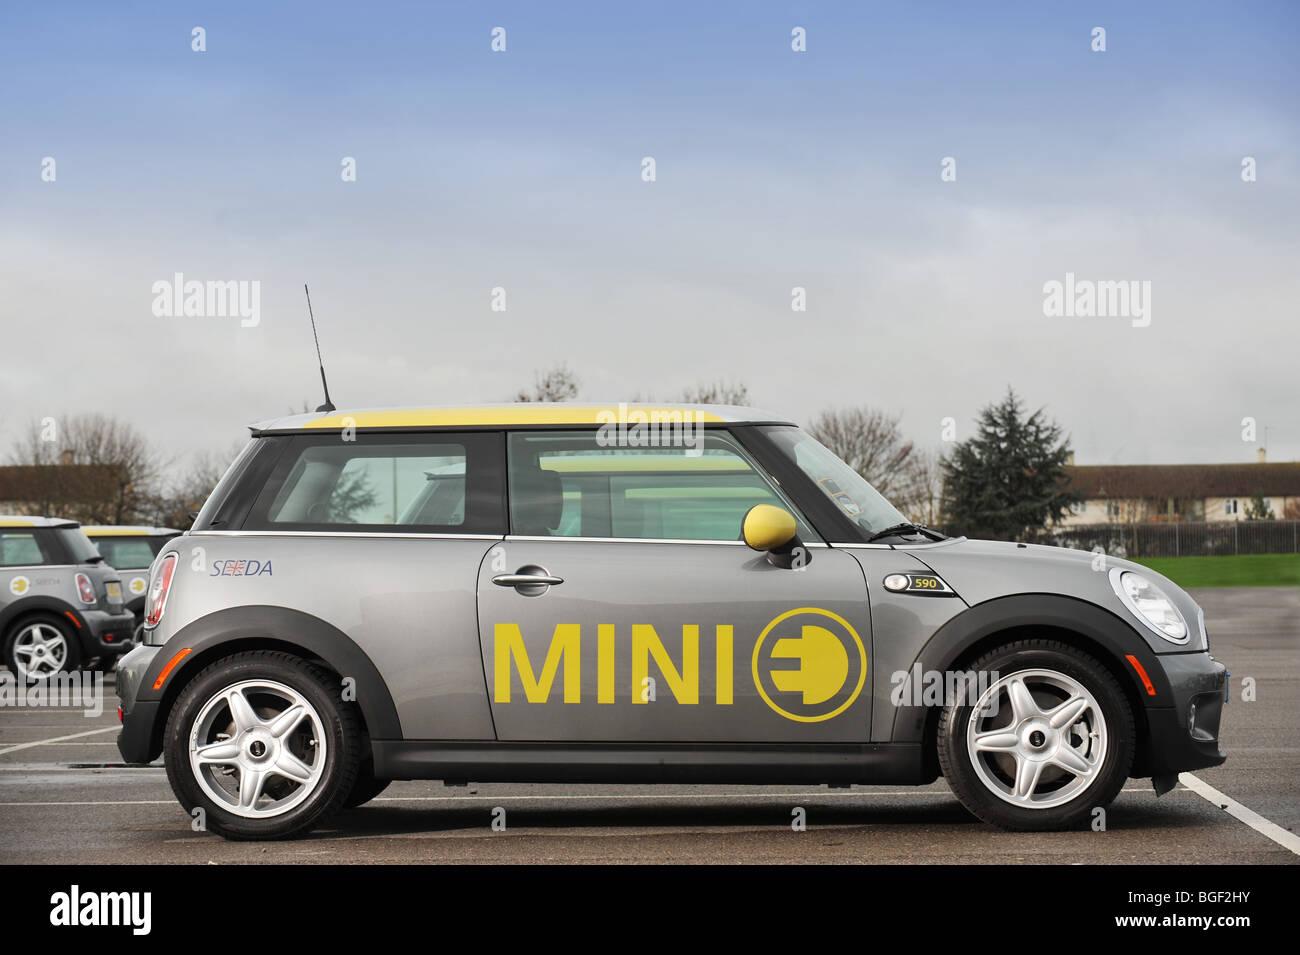 Mini e coche eléctrico Imagen De Stock